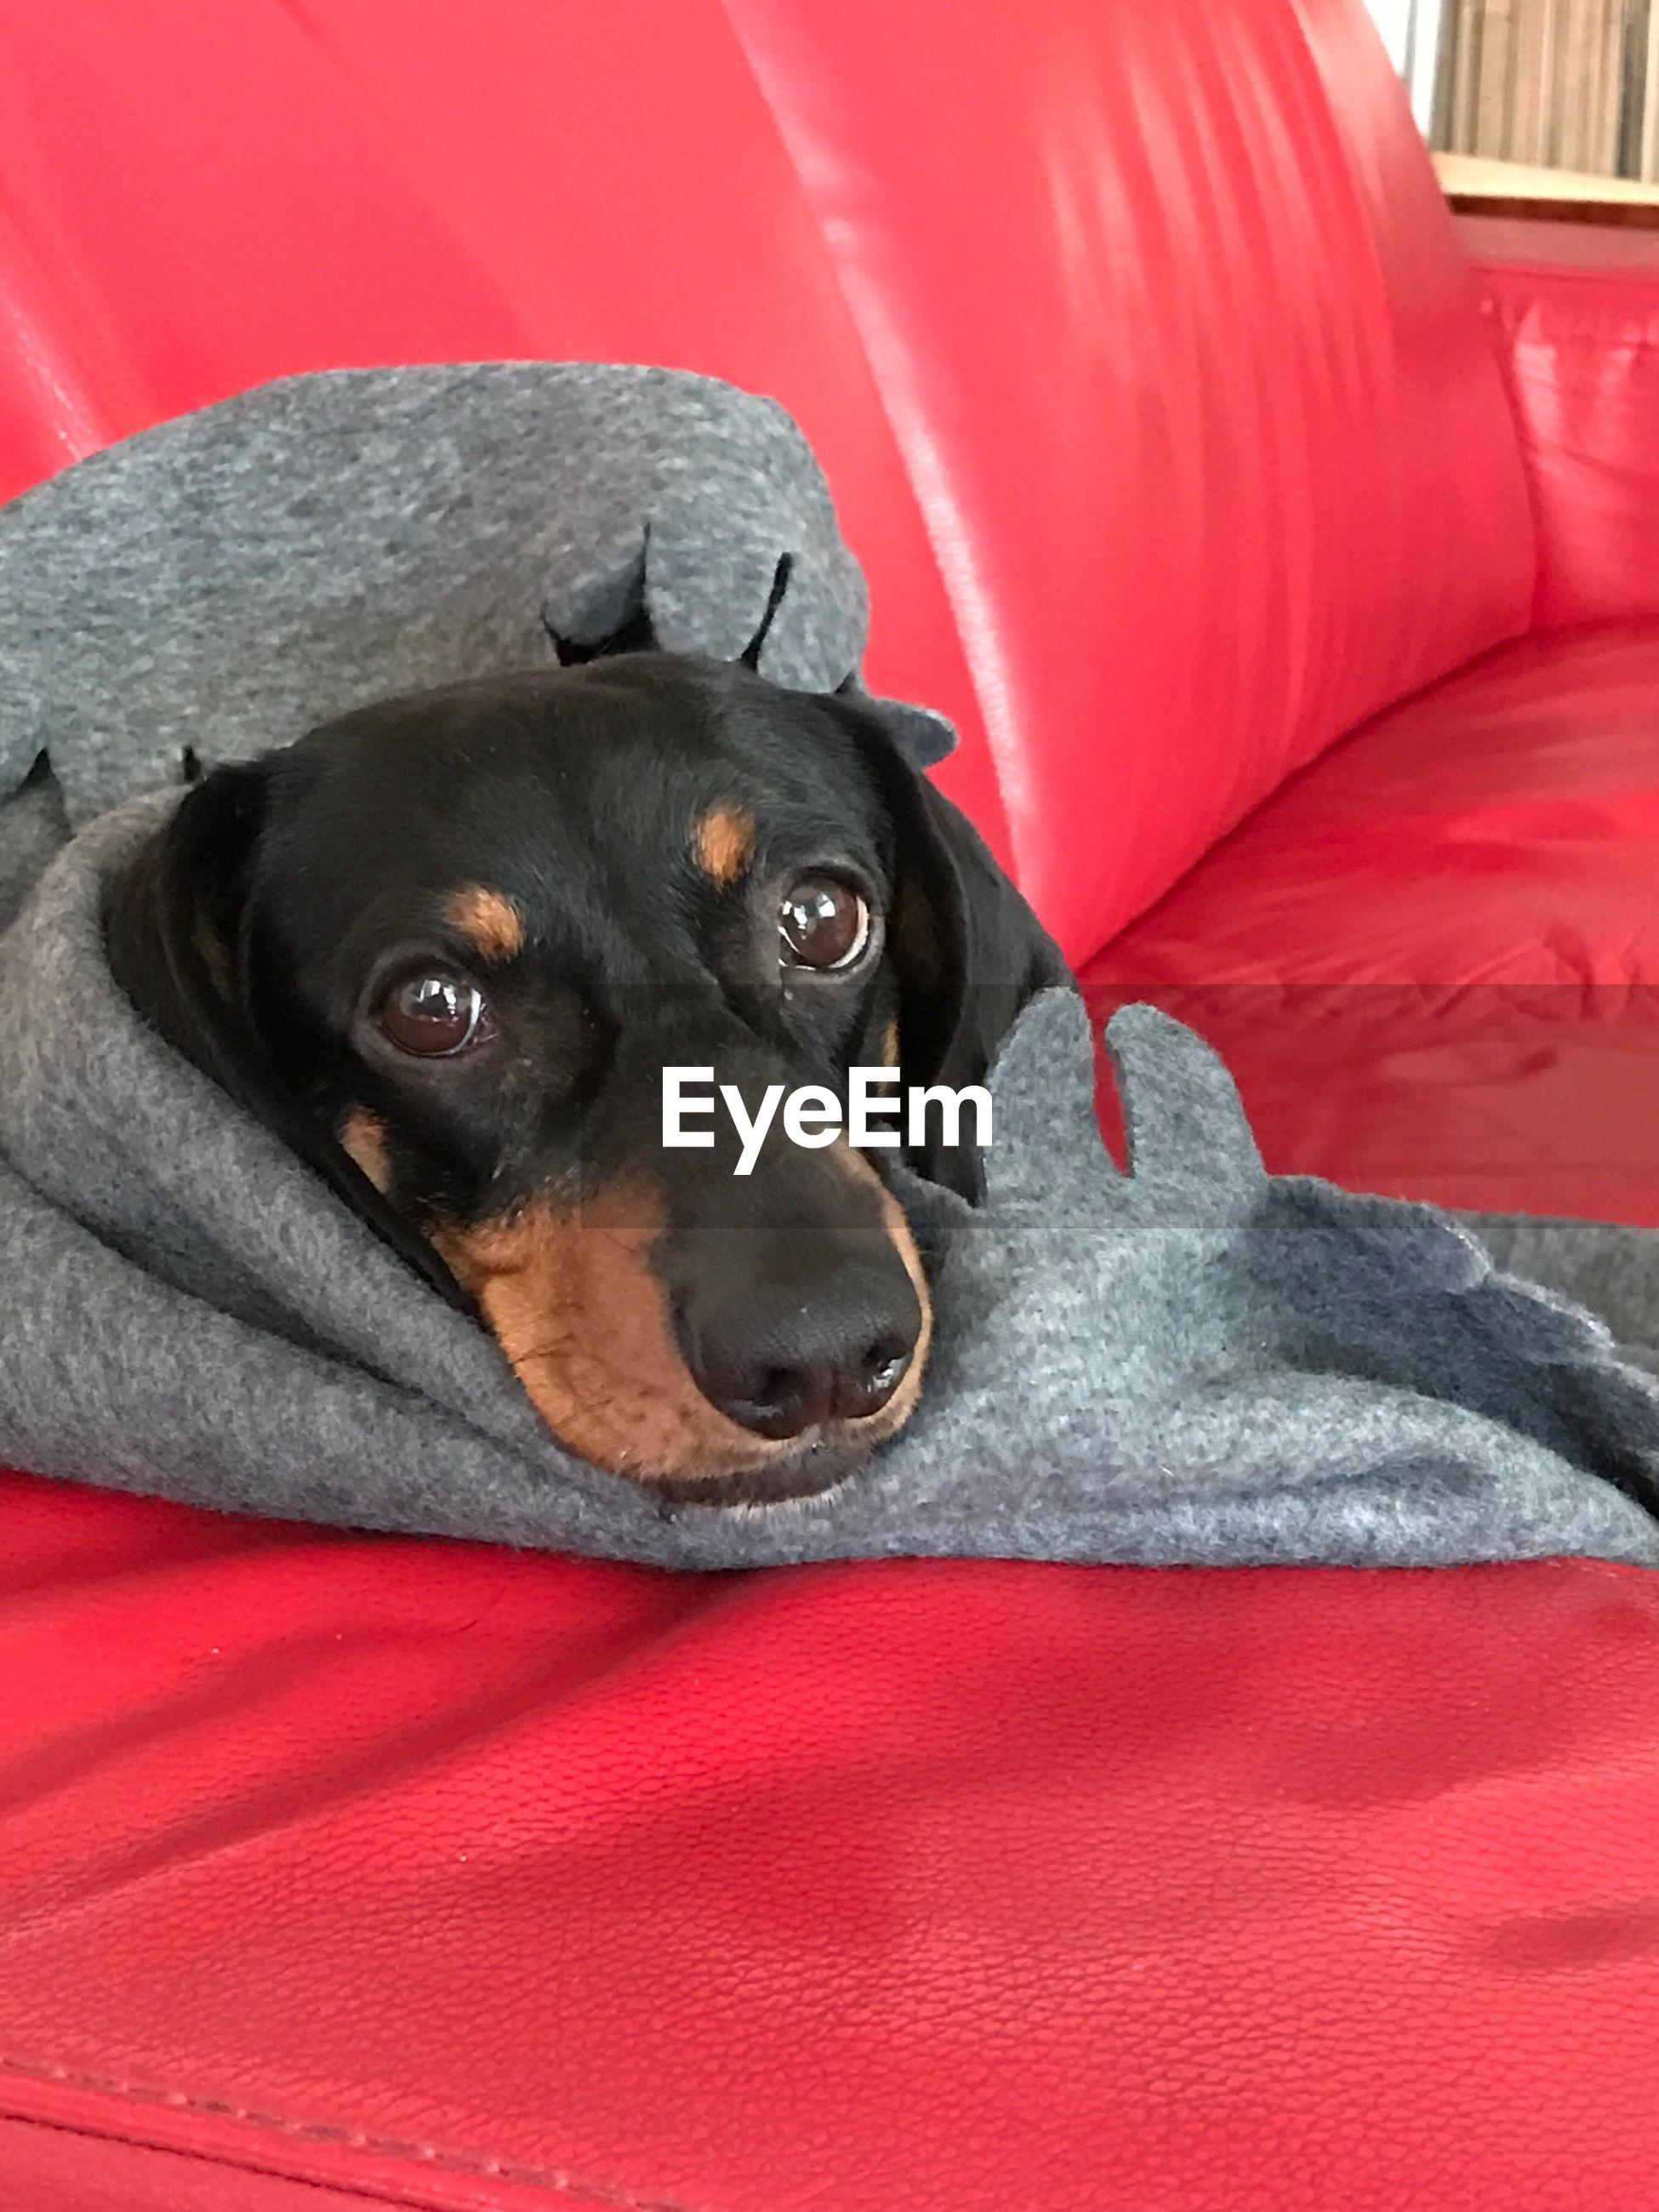 Close-up portrait of black dog with clothing on sofa